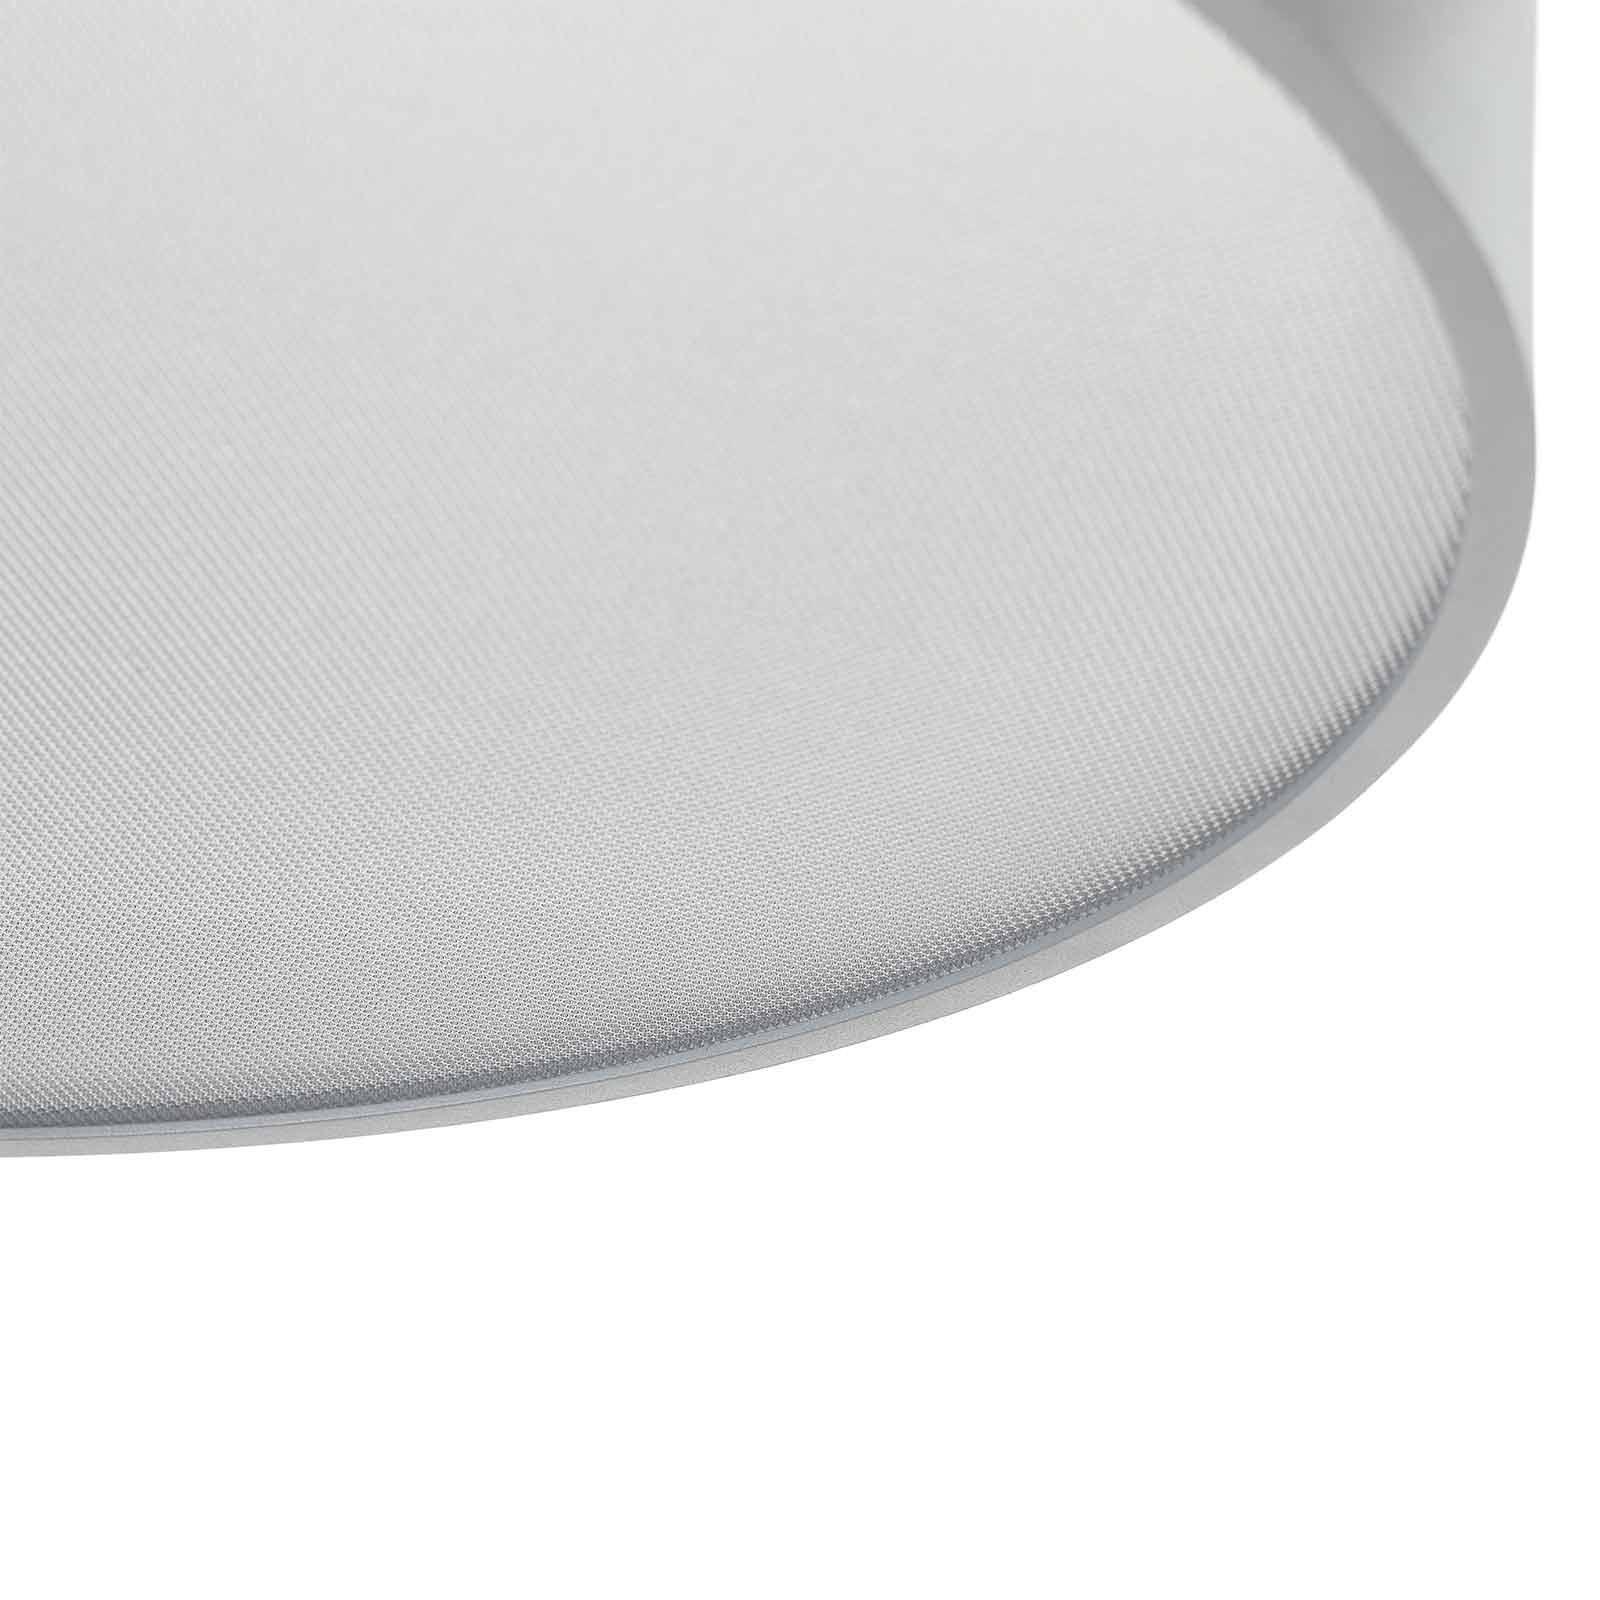 Arcchio Vikato LED-taklampe, 4 000 K 40 cm